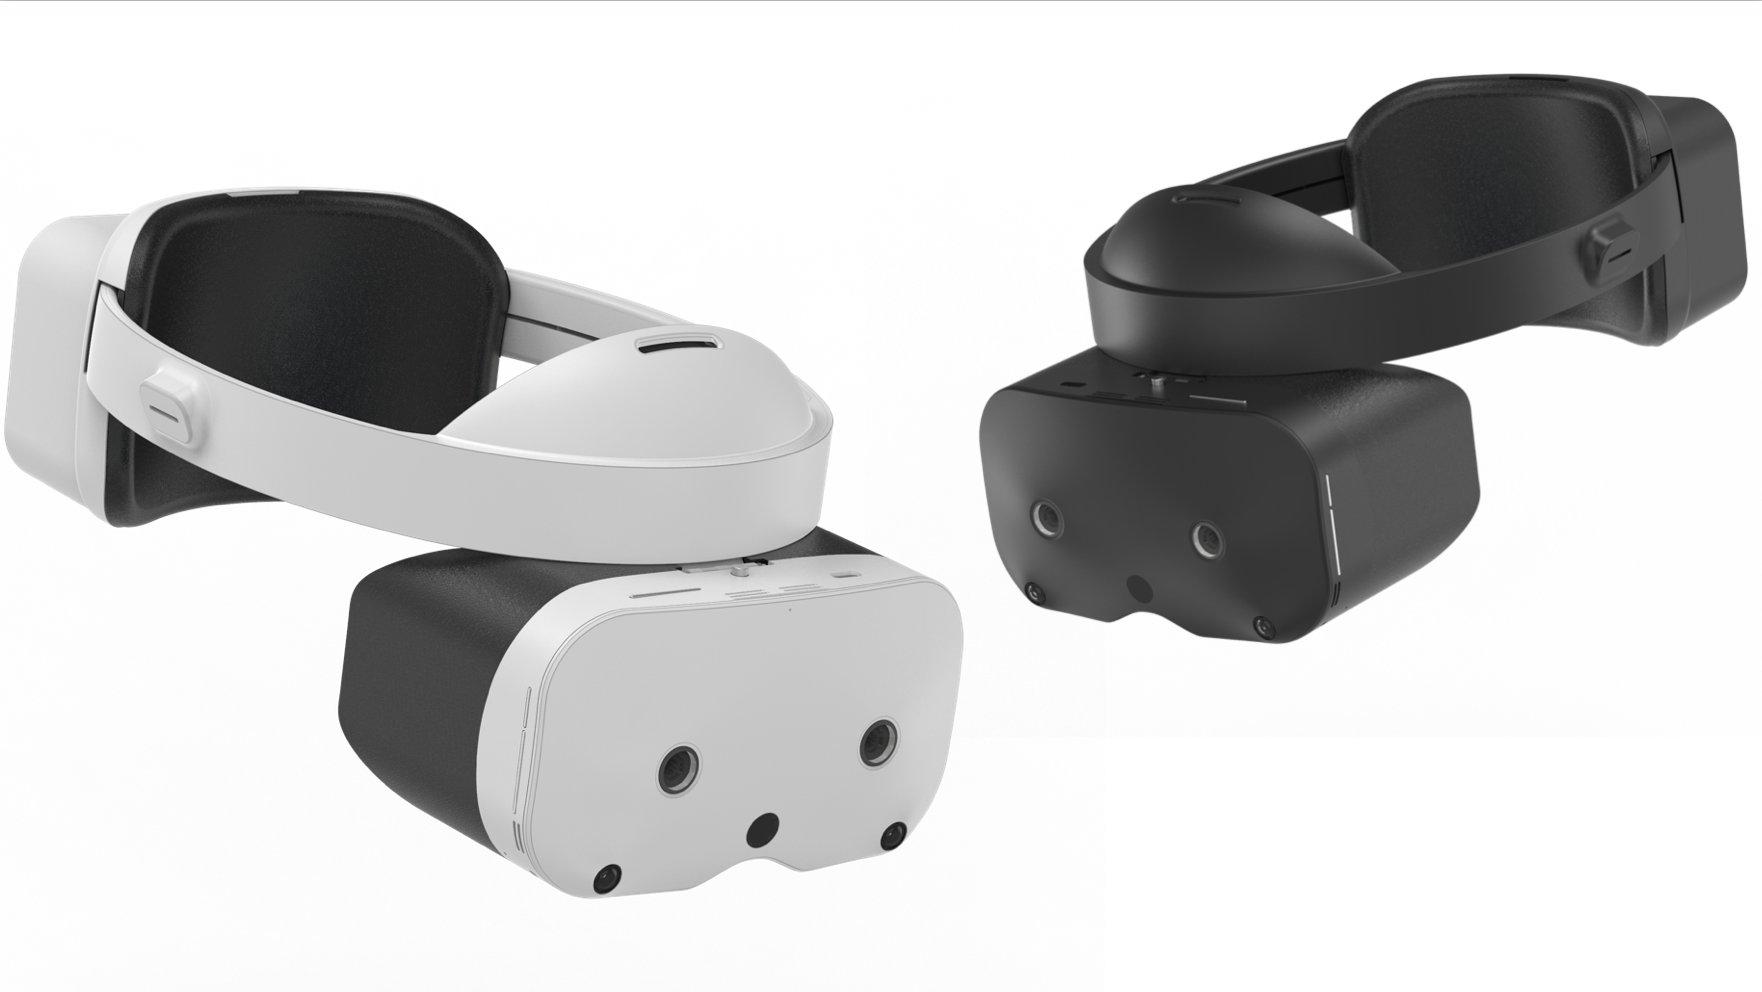 VR初创公司Lnyx将大幅降低Lynx R1头显价格以推动C端市场